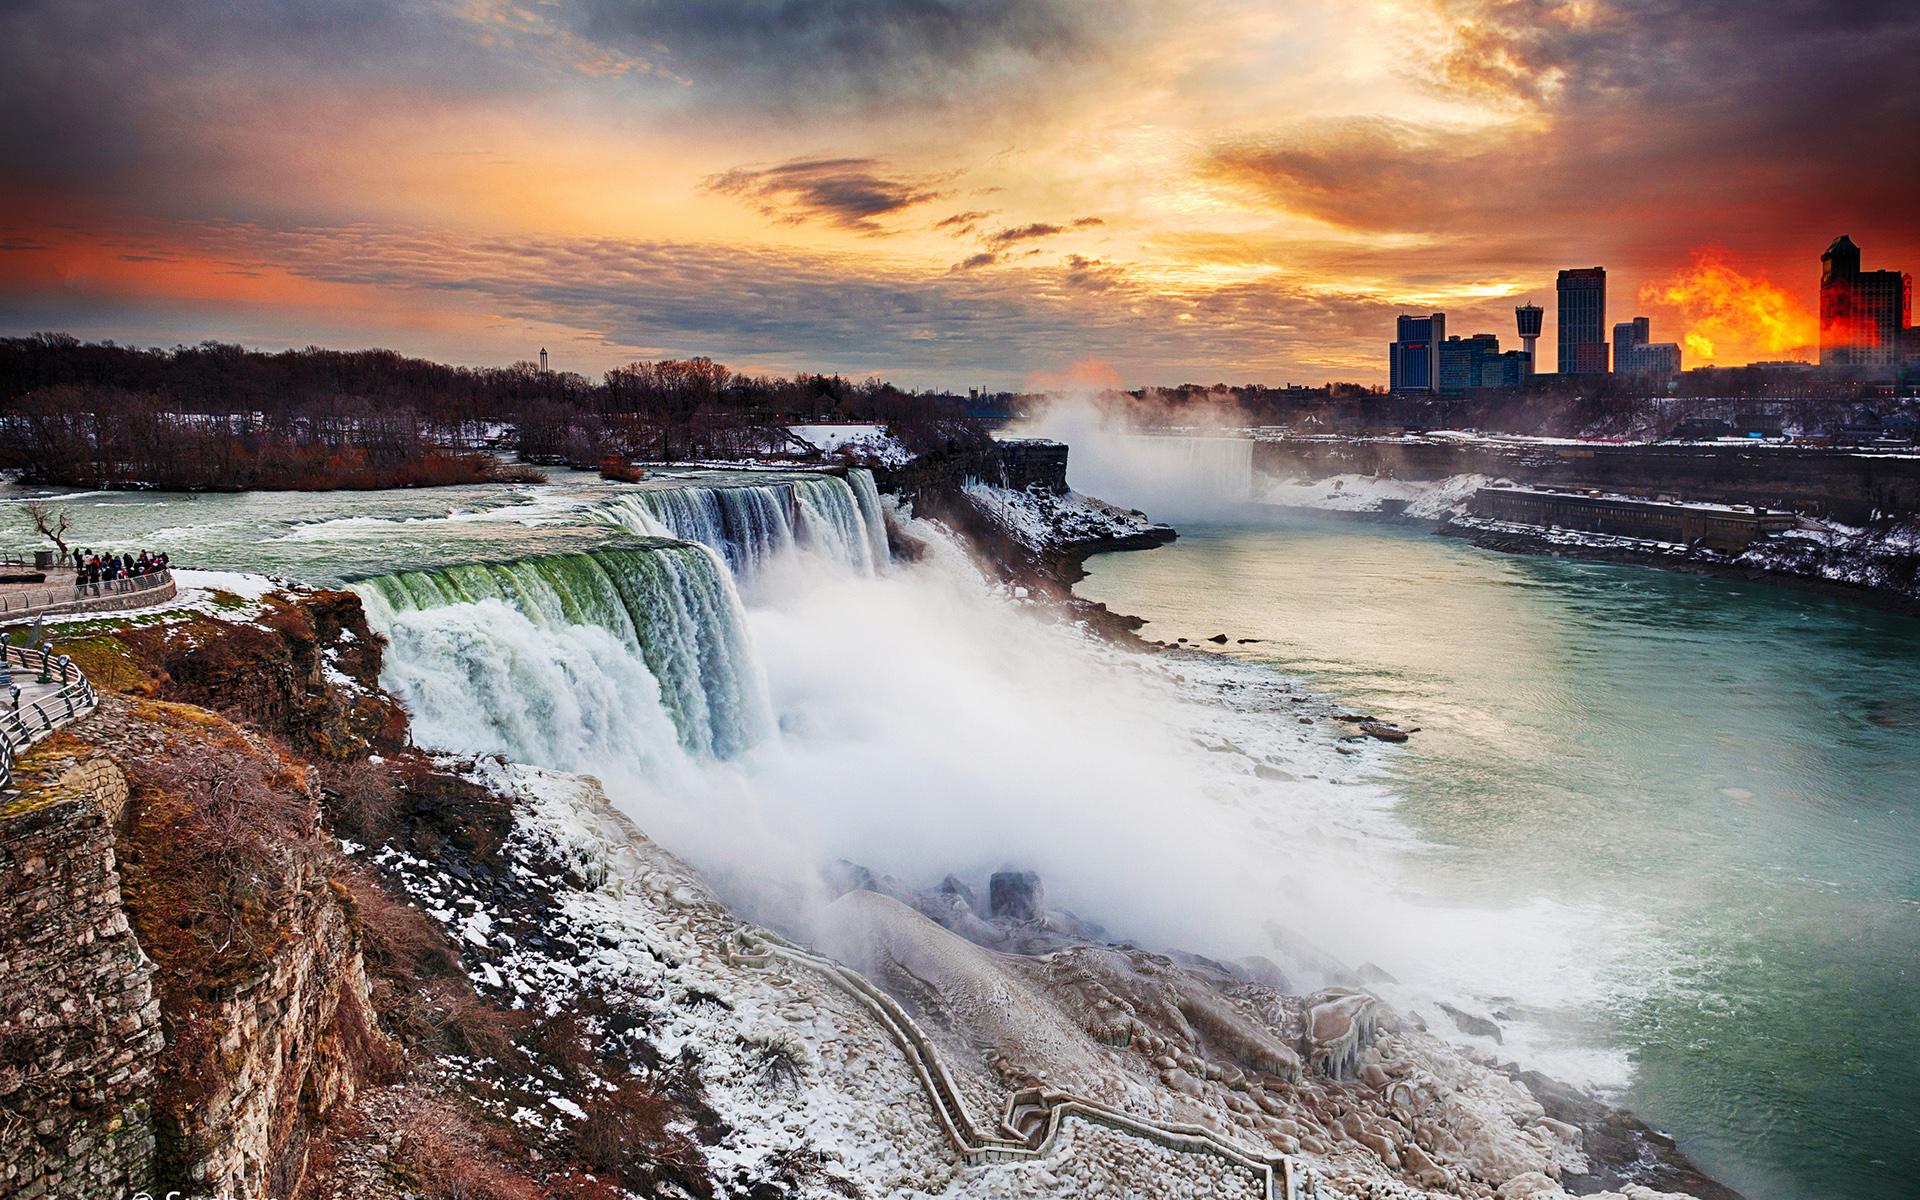 Fall Foliage Wallpaper For Iphone Niagara Falls Full Hd Wallpaper And Background Image